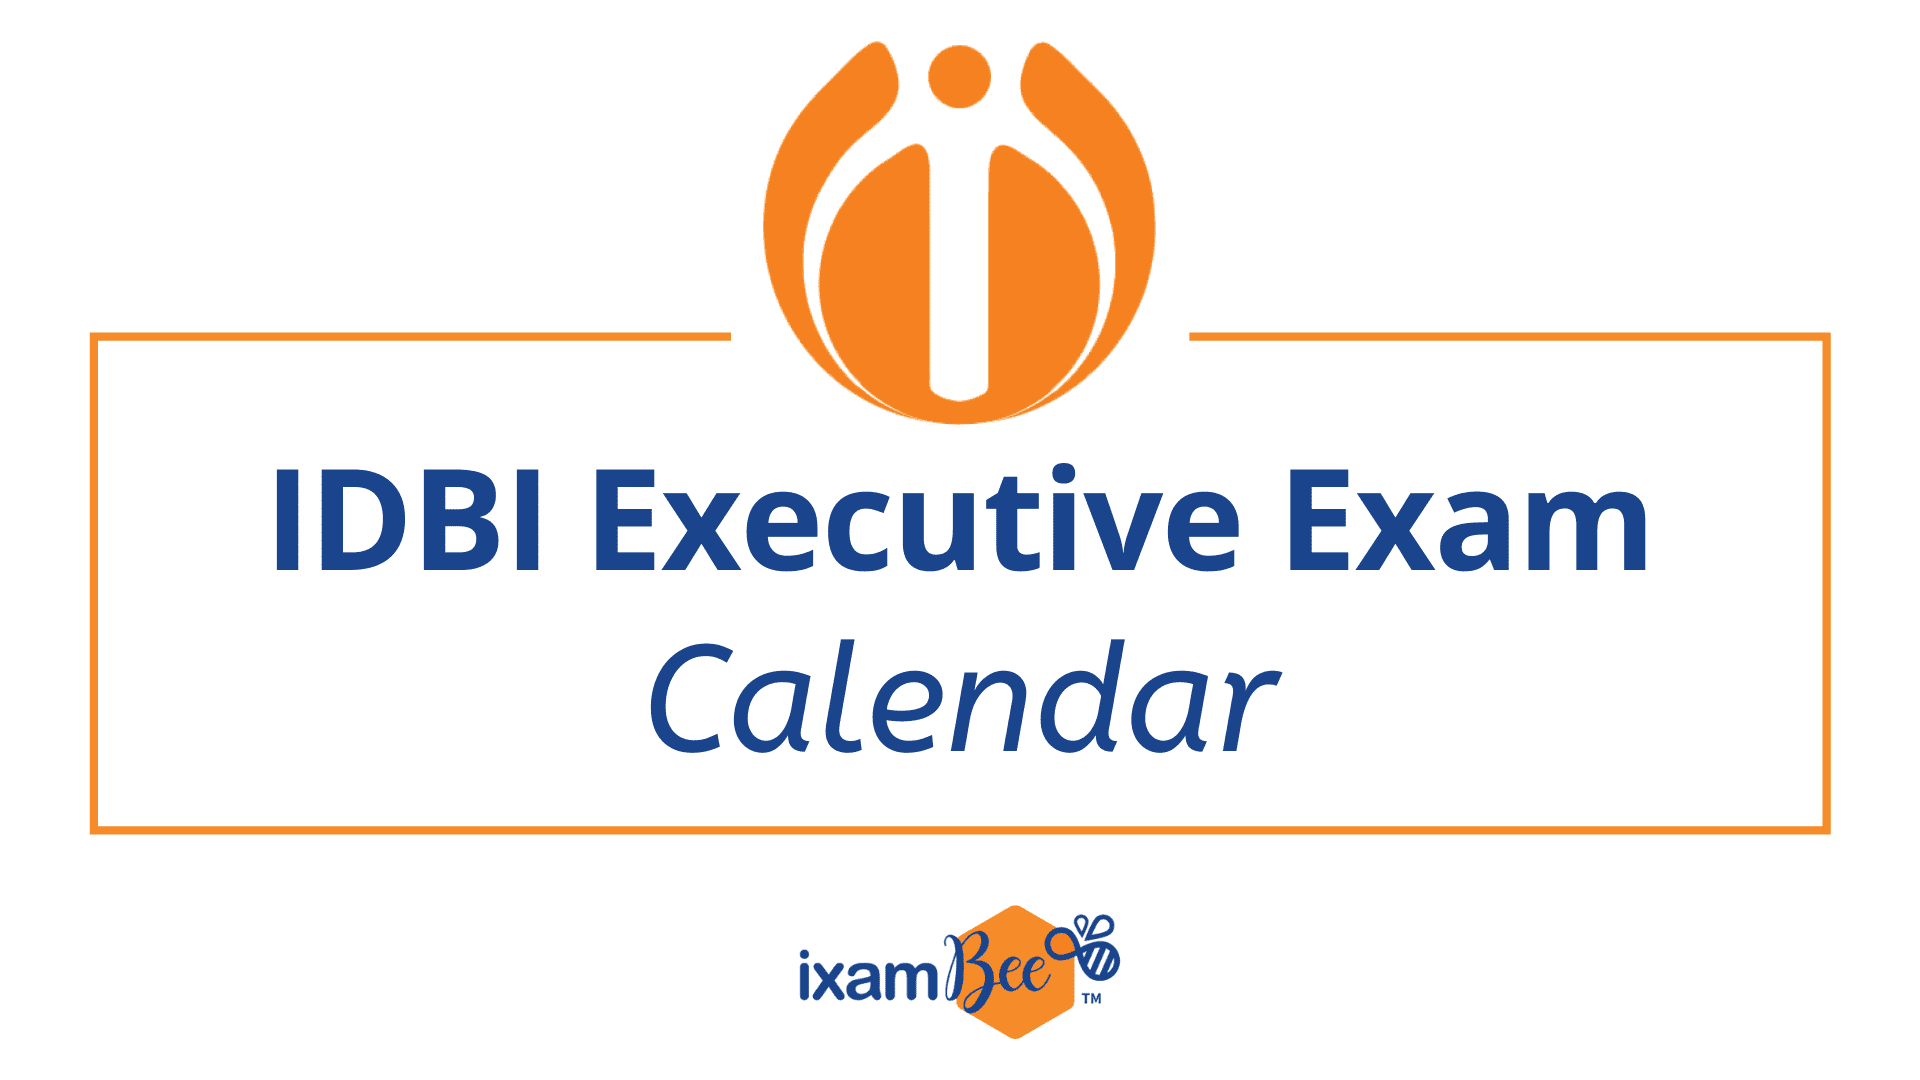 IDBI Executive Exam Calendar